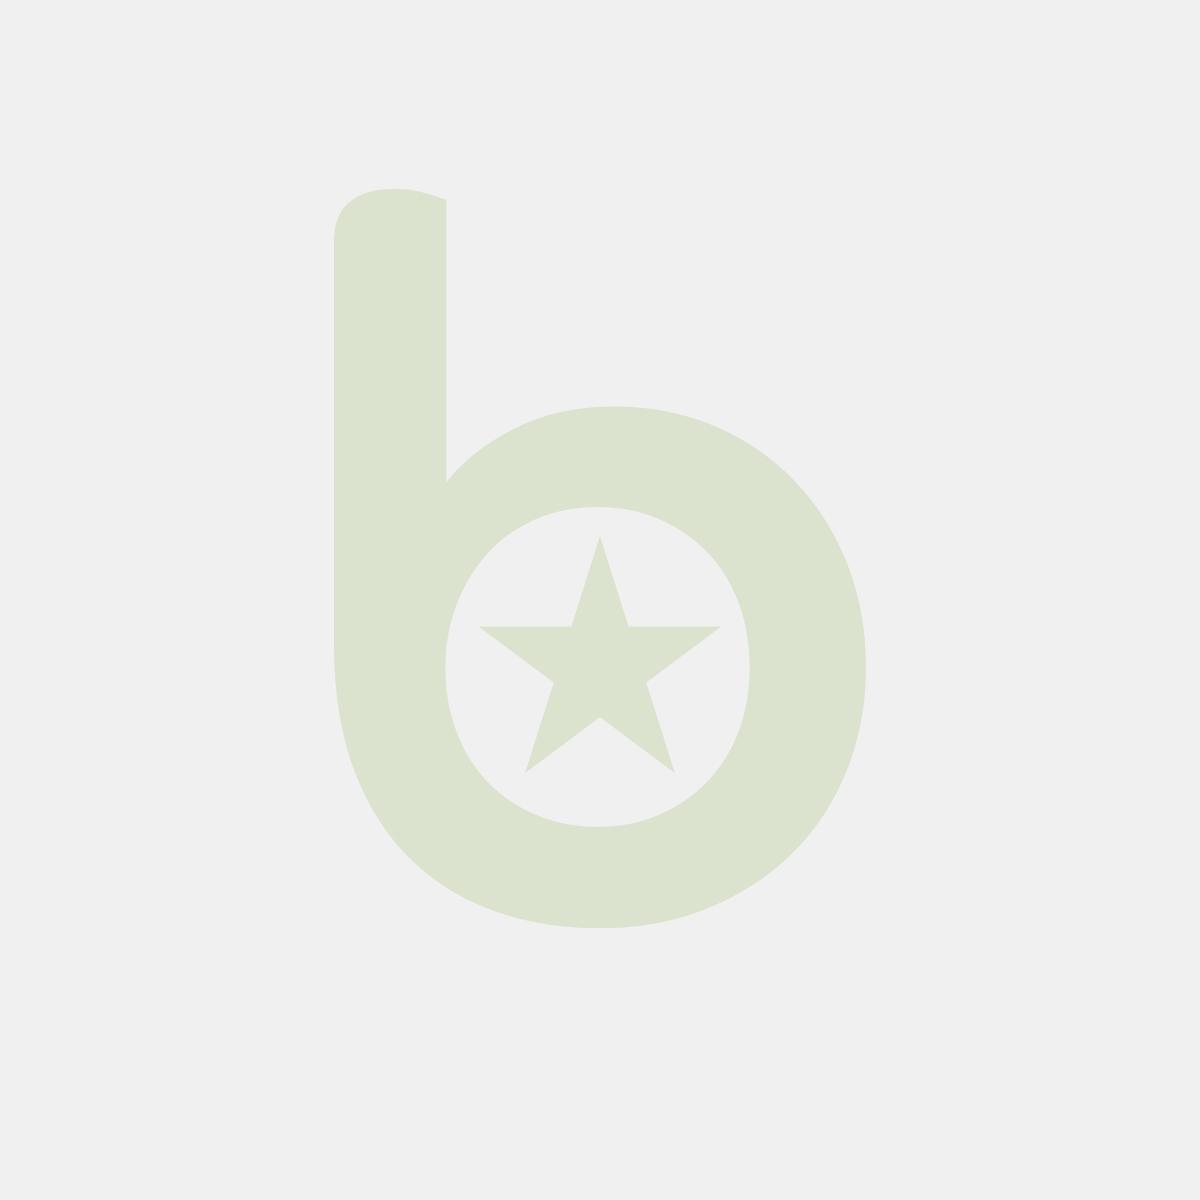 Frytownica Blue Line 205853